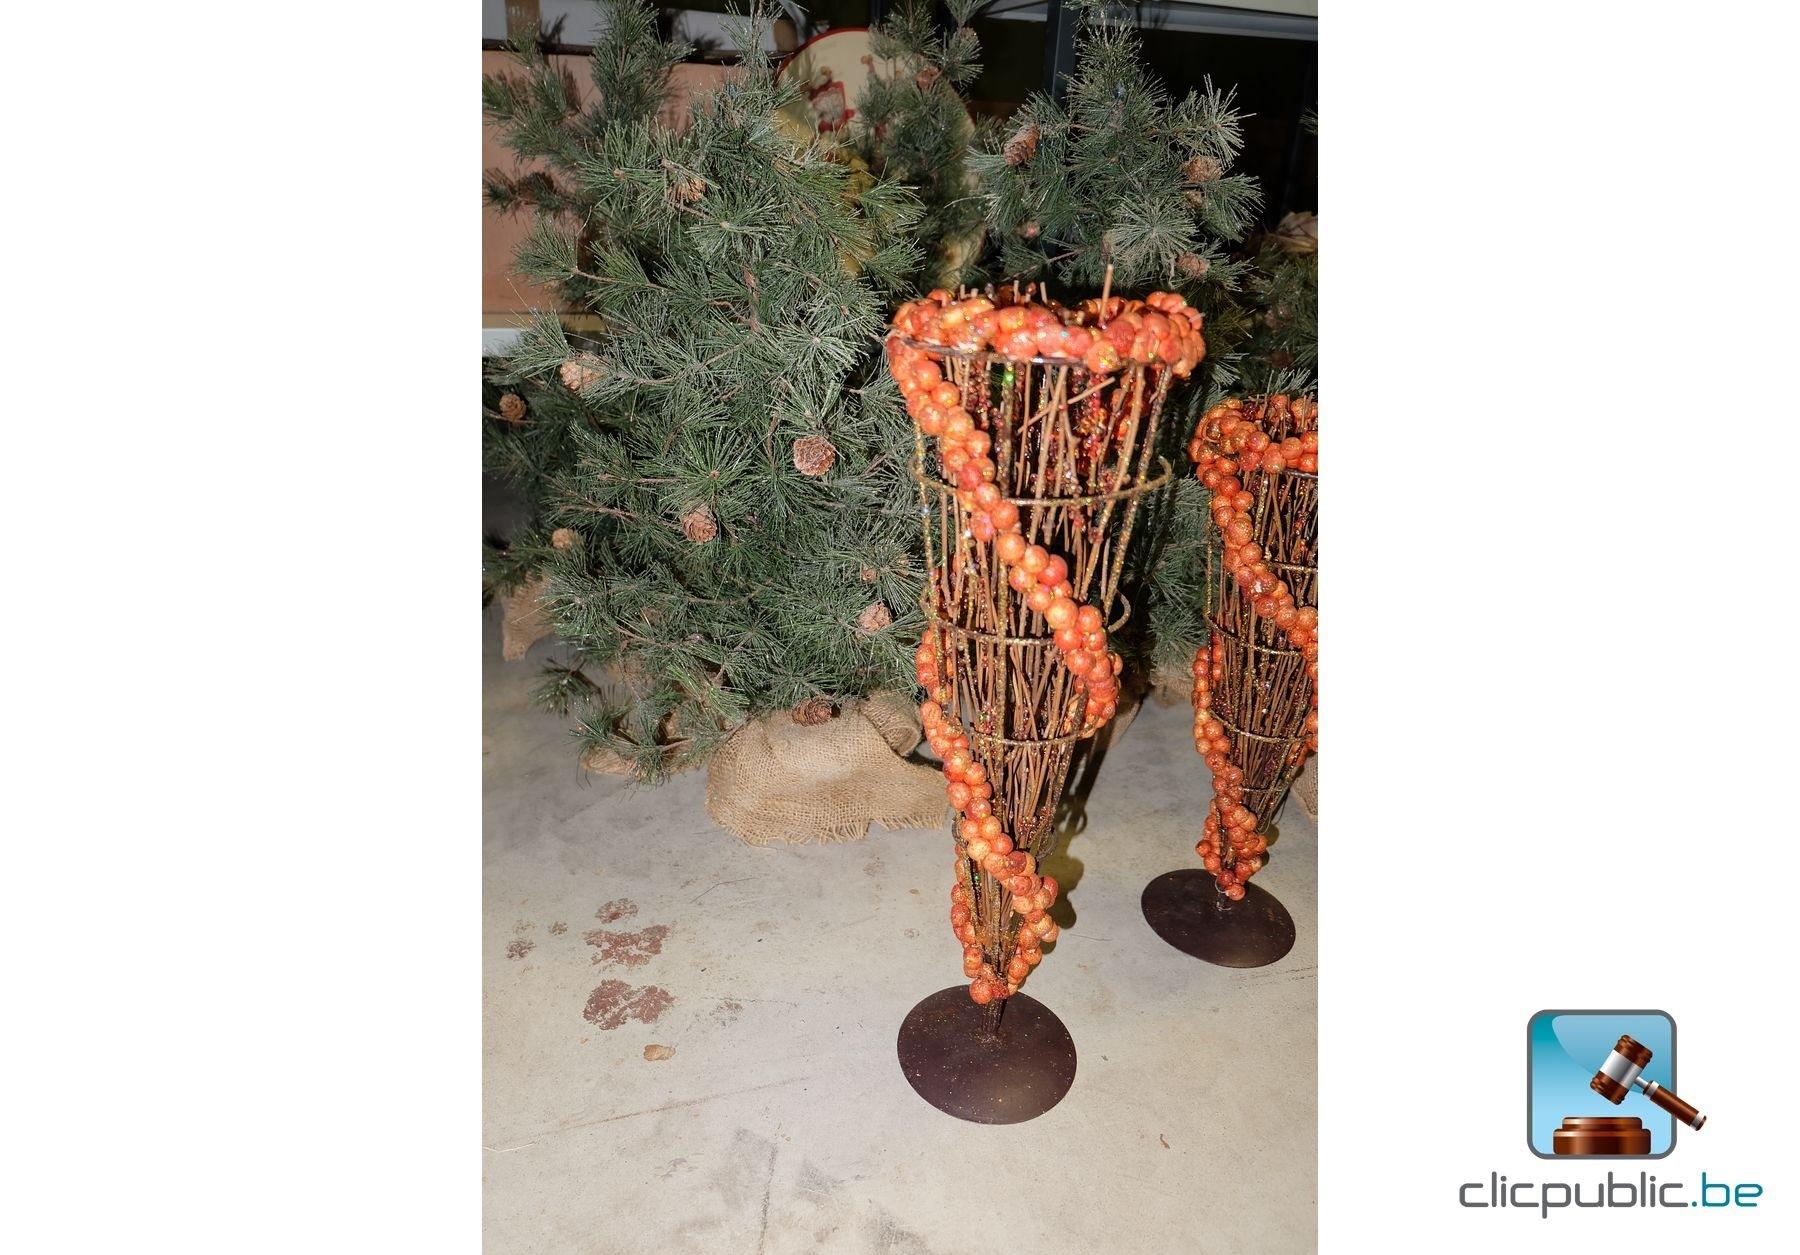 #A64B25 Décorations De Noël (ref. 27) à Vendre Sur Clicpublic.be 5319 decorations de noel a vendre 1800x1255 px @ aertt.com